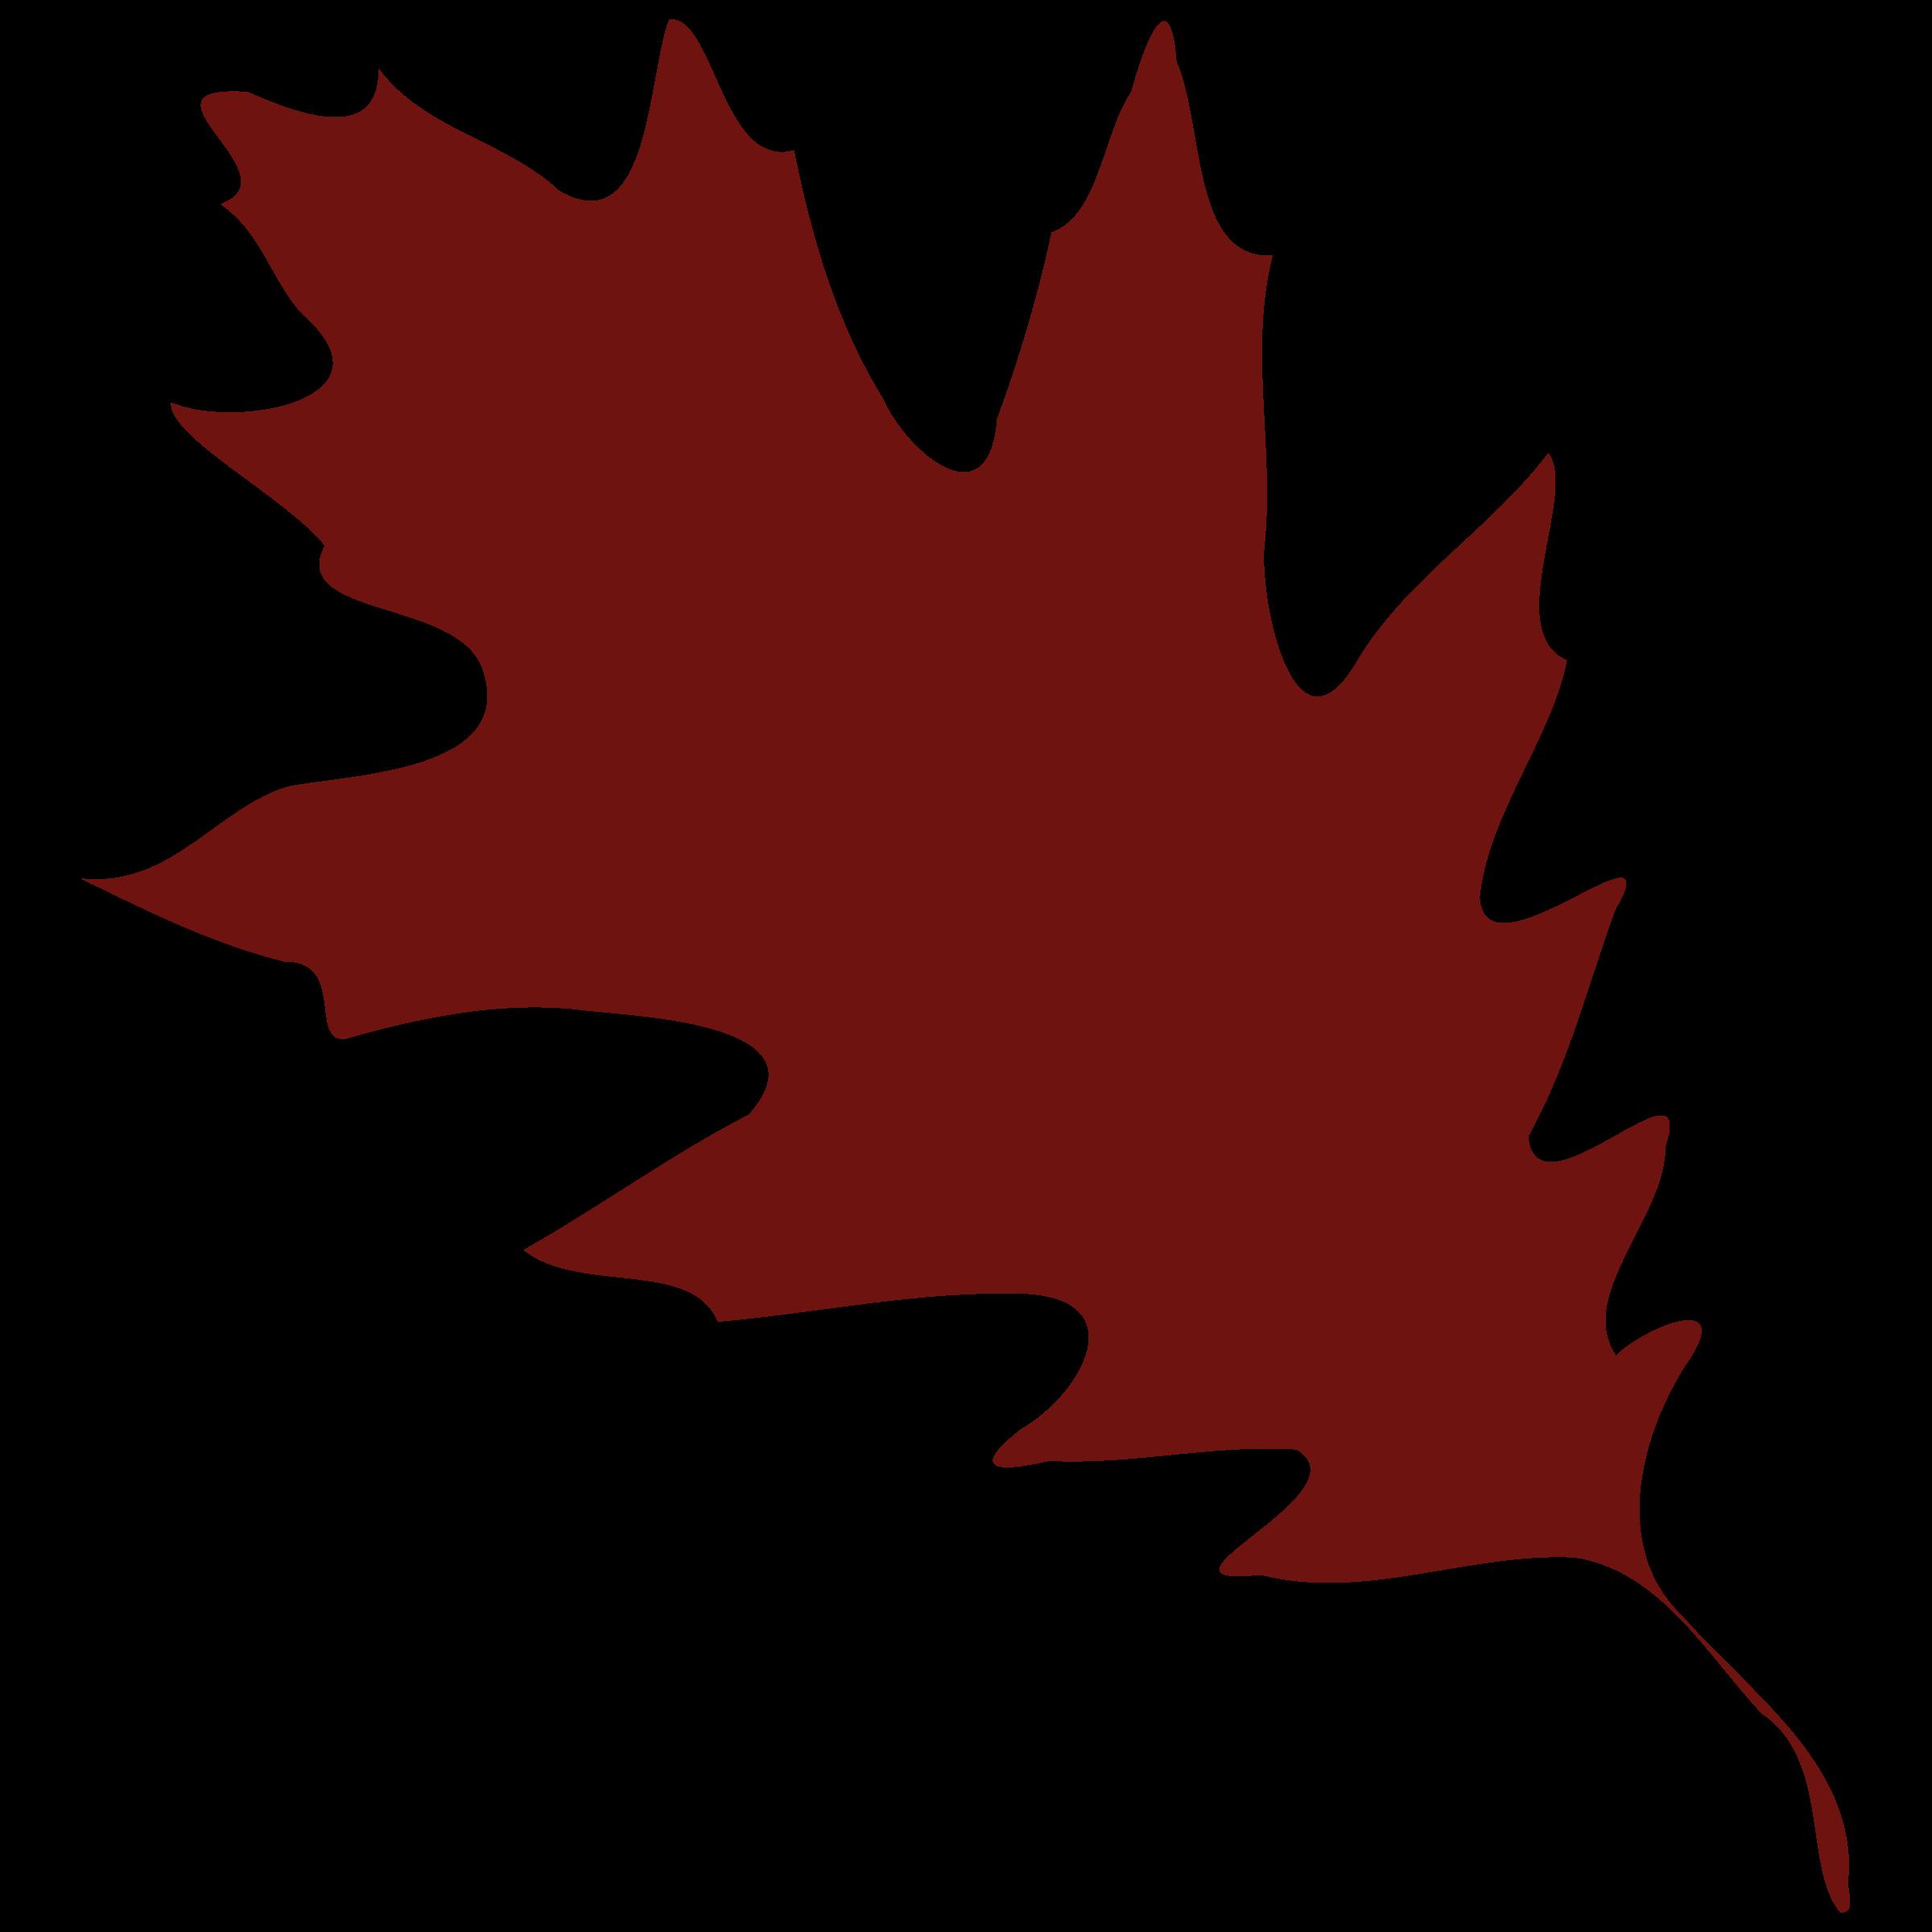 2400x2400 Pleasurable Design Ideas Maple Leaf Clipart Clip Art Free Vector